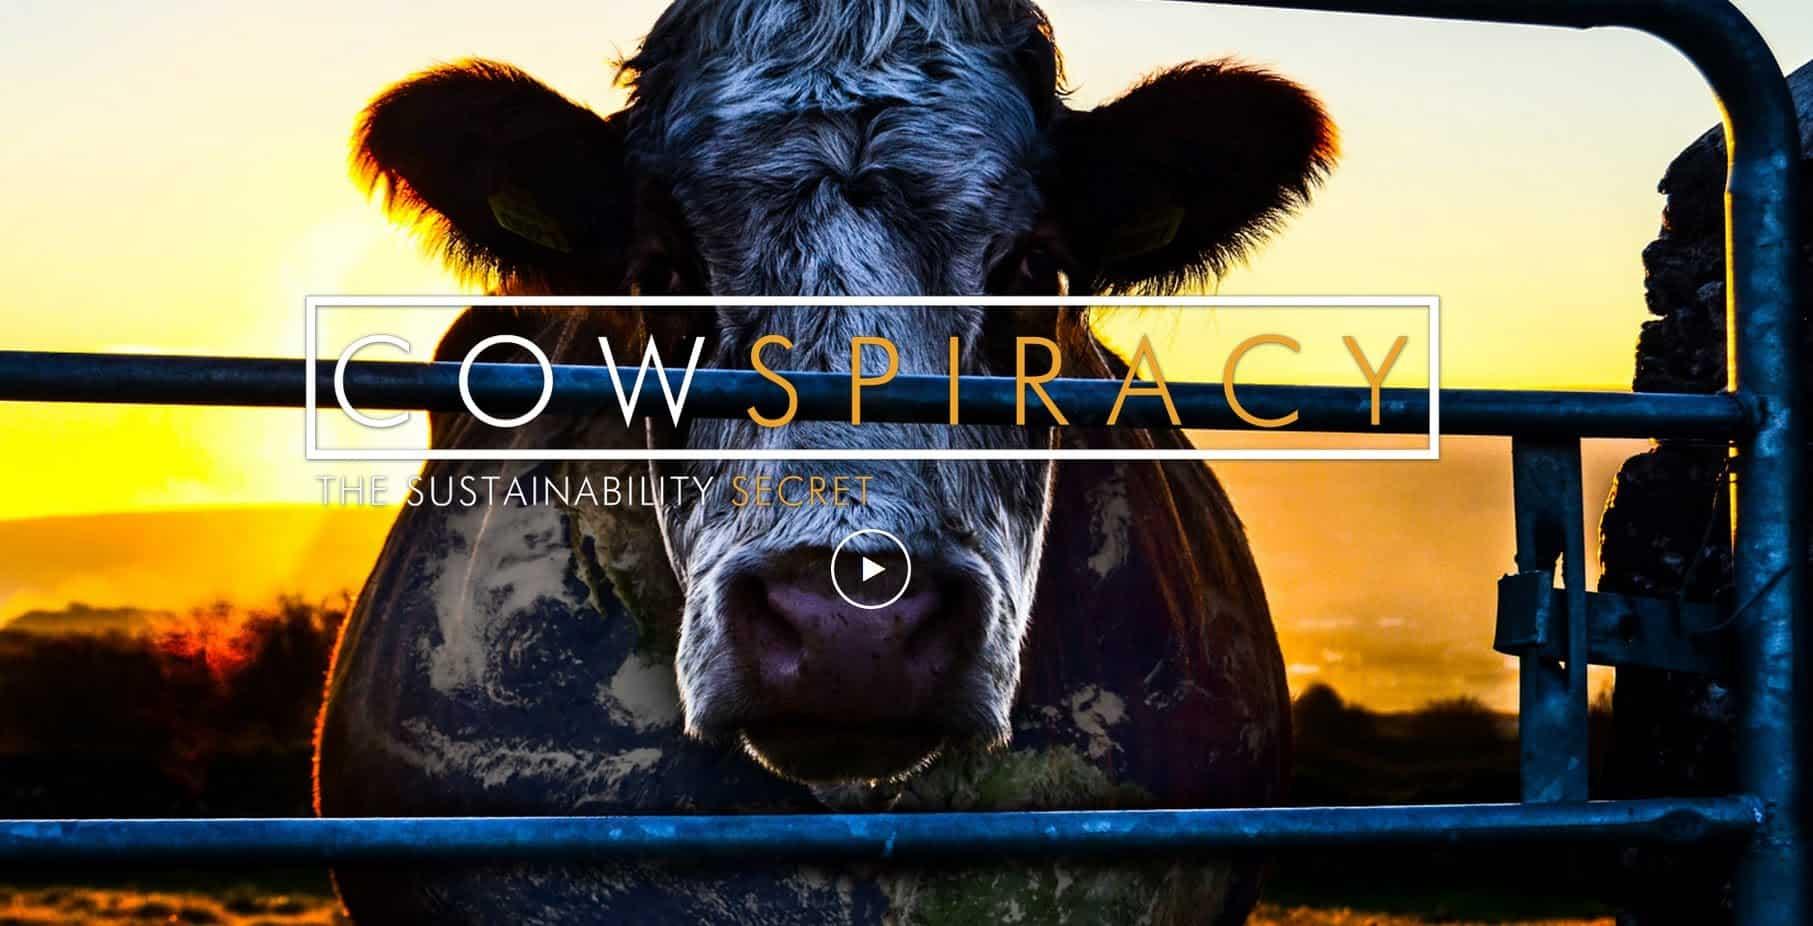 Best Vegan Documentaries to Watch